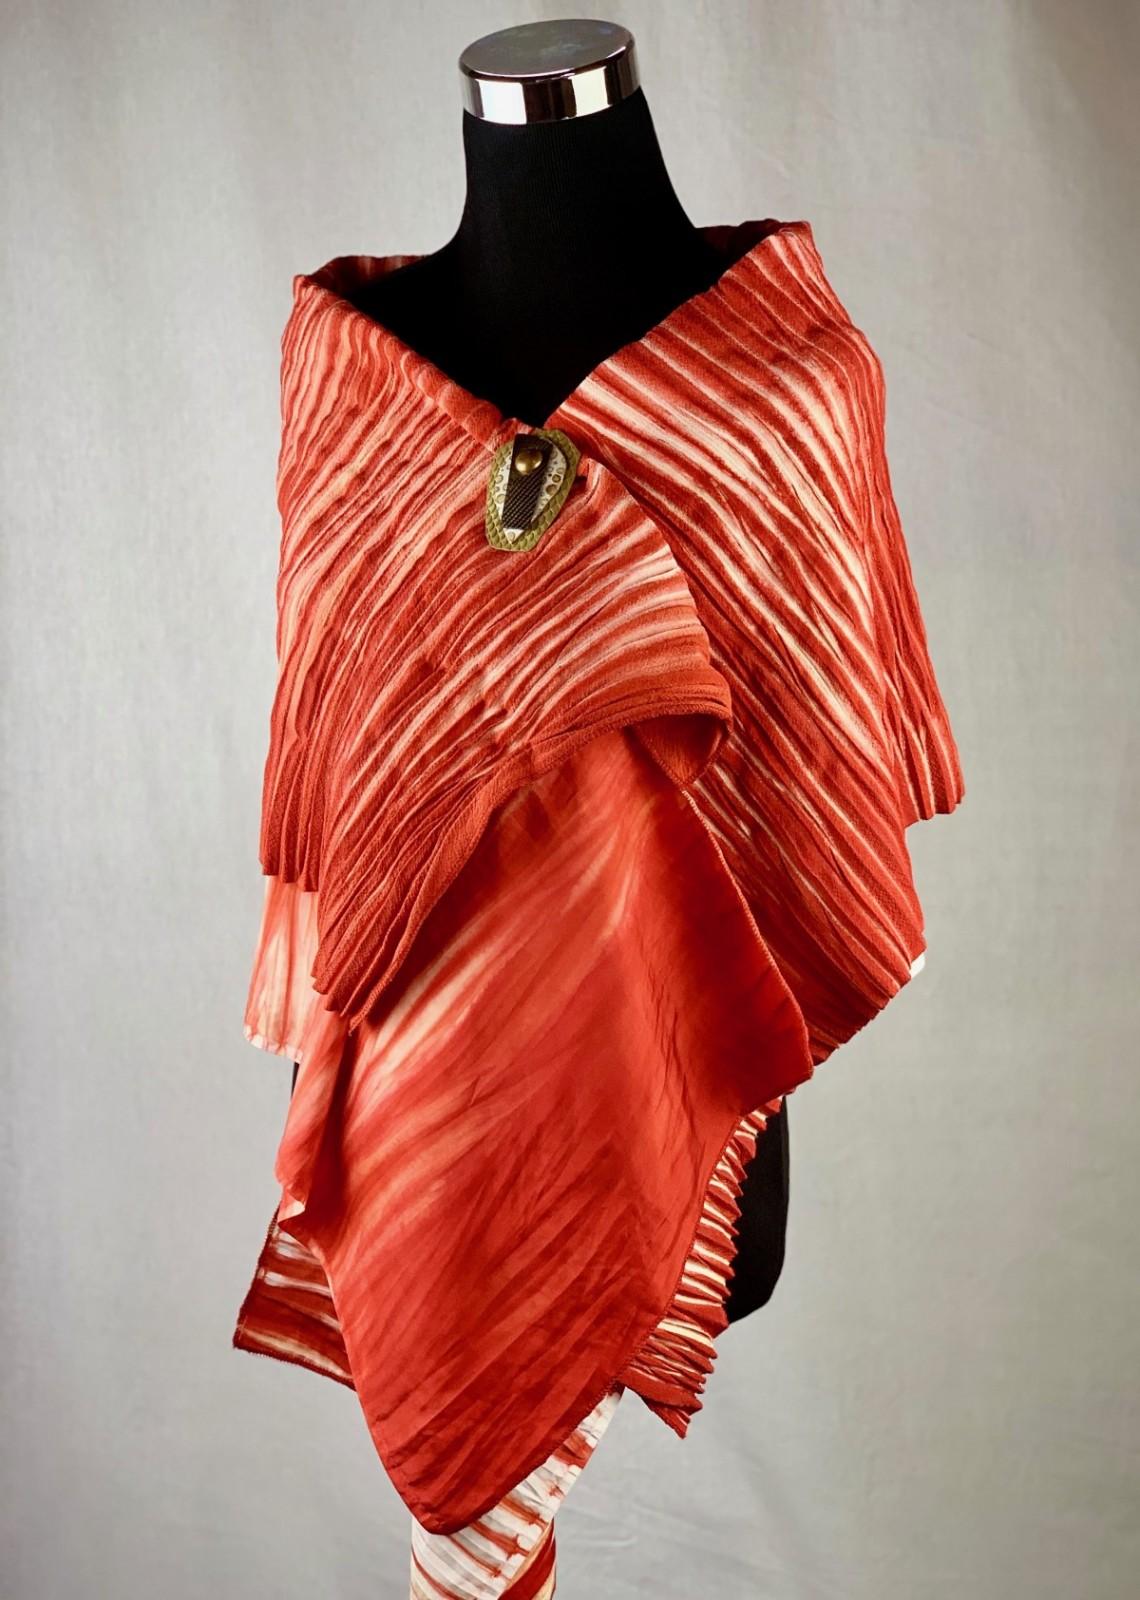 Trunk Show Features Textile Artist Diane Kuehn